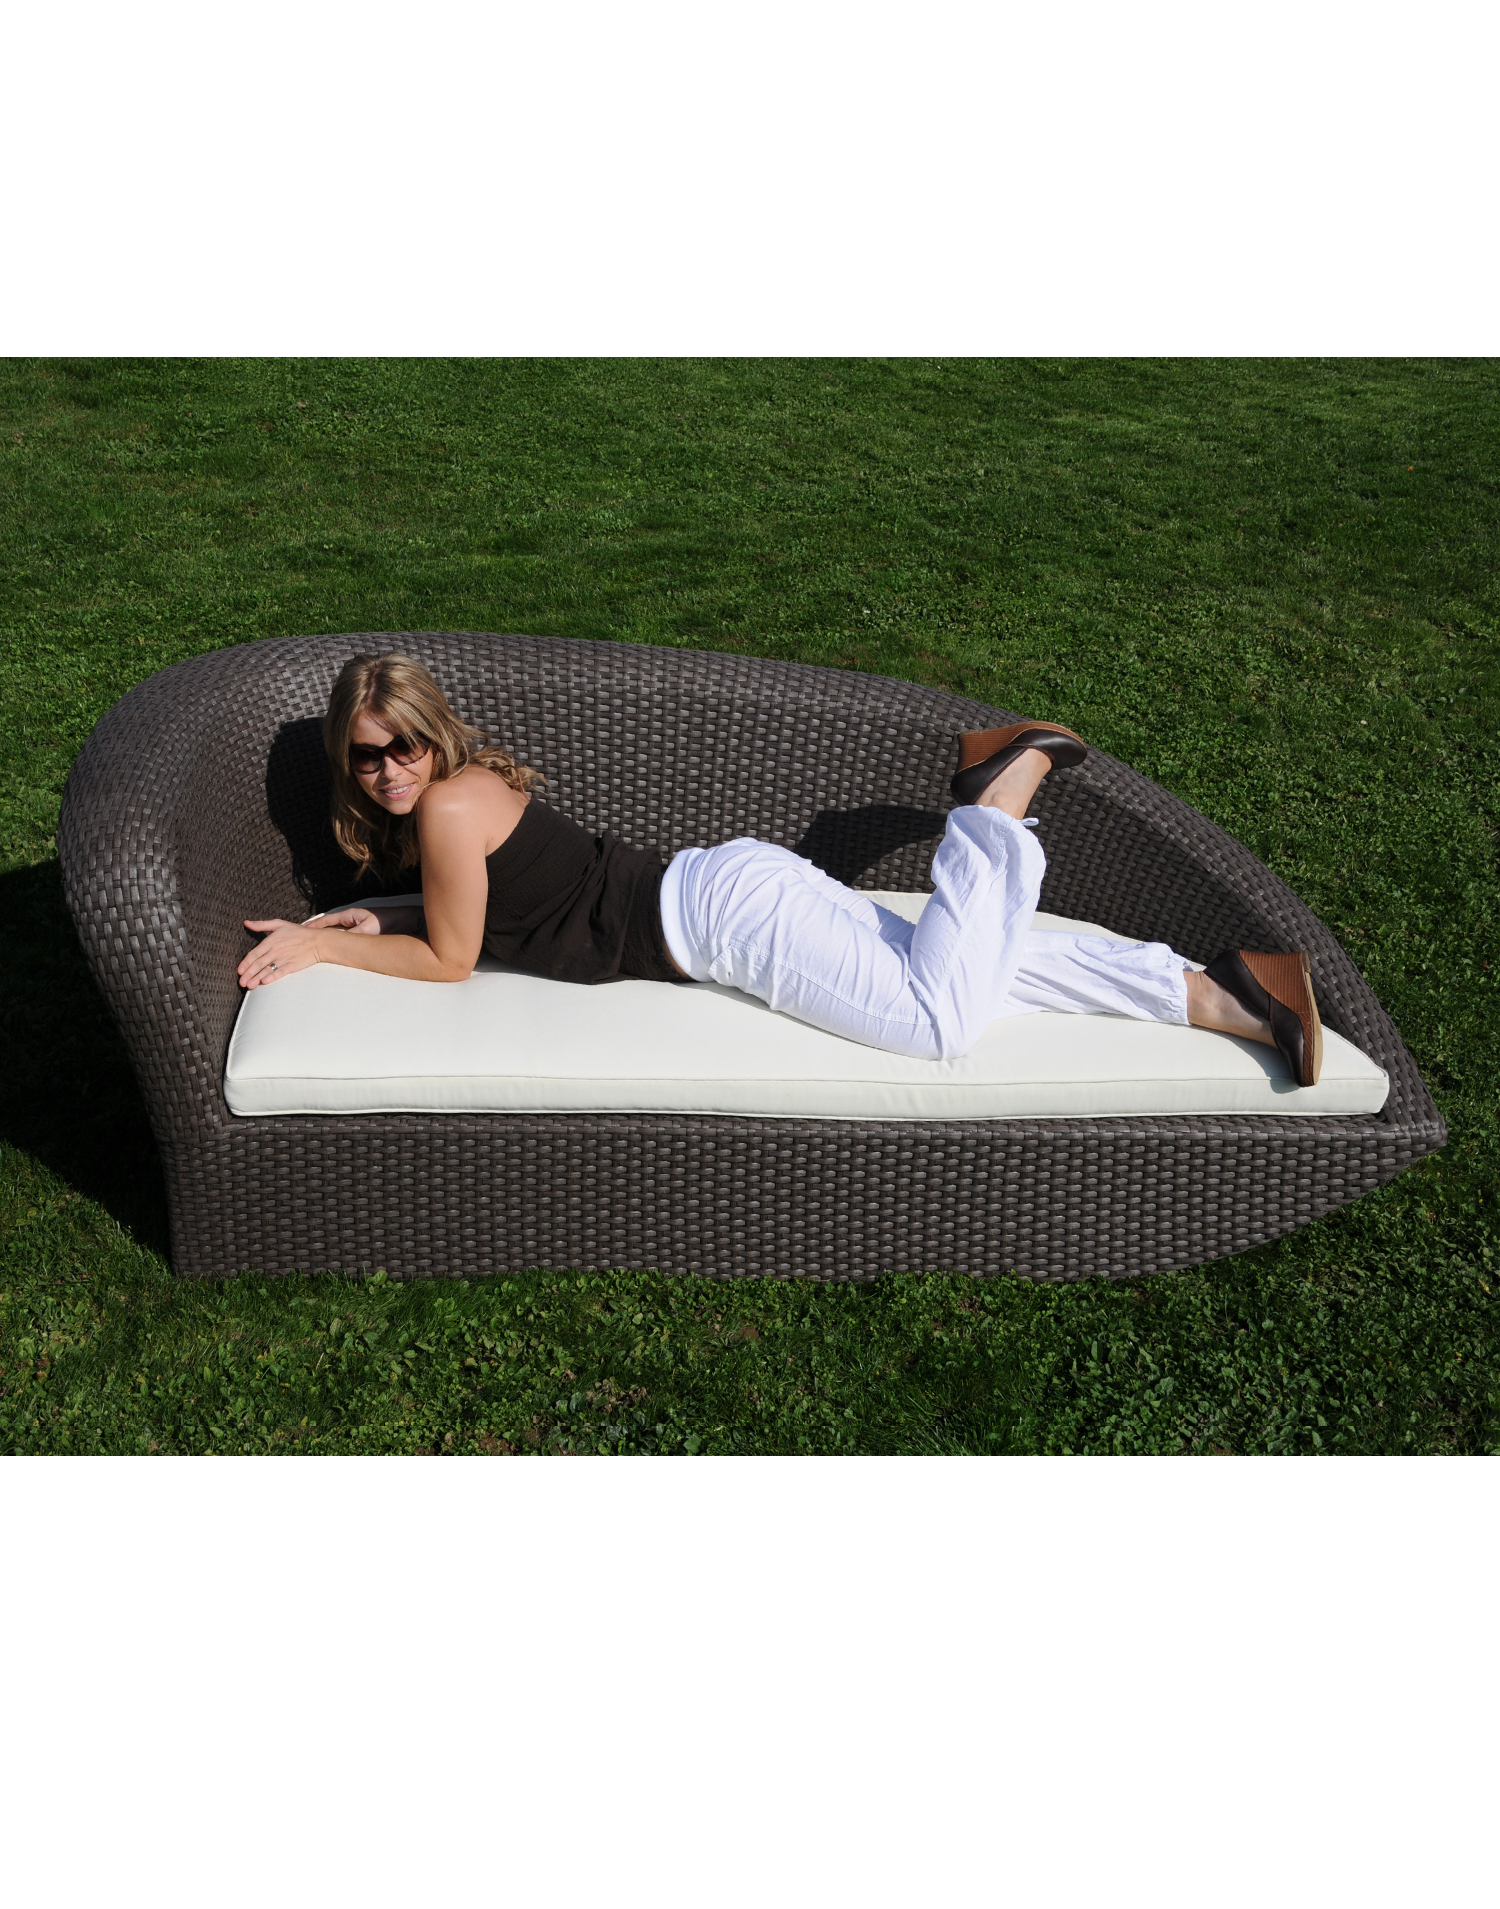 chaiselongue valencia rattan lounge. Black Bedroom Furniture Sets. Home Design Ideas